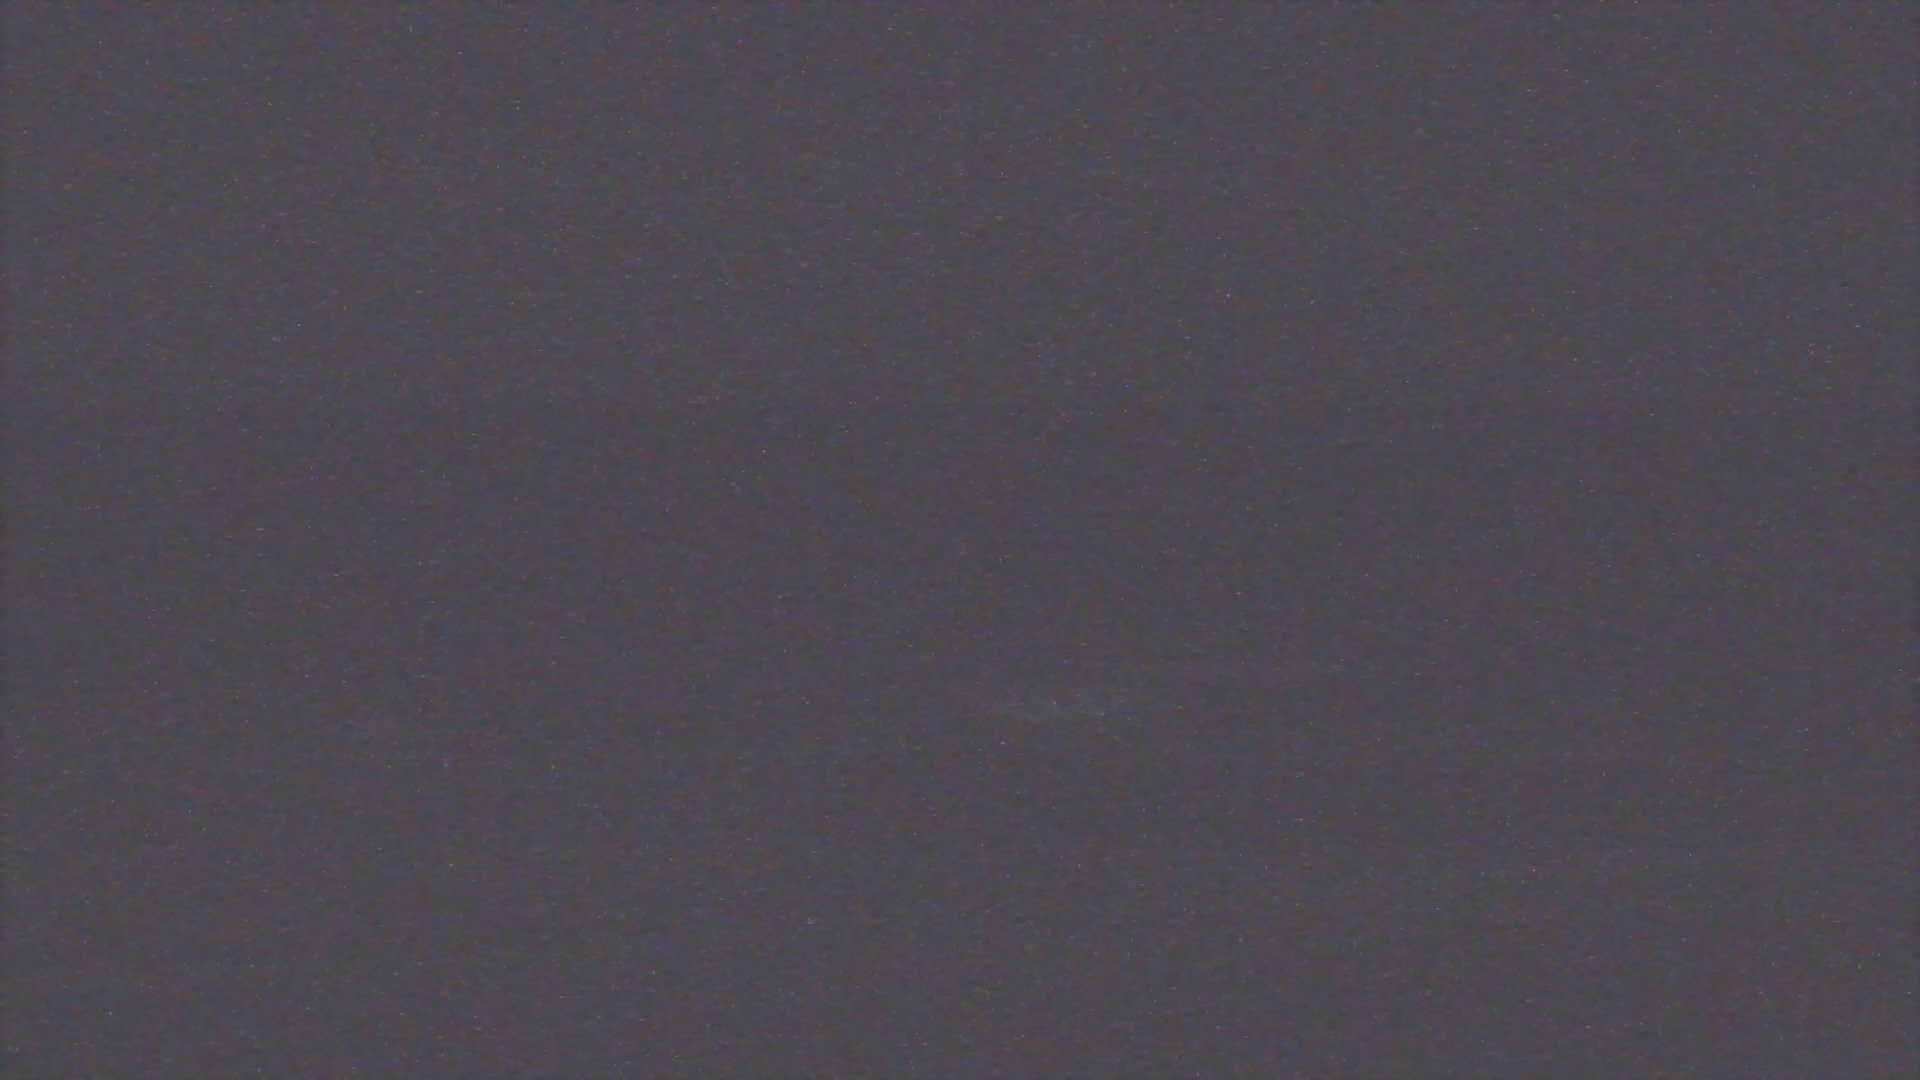 Torquay surfcam still image